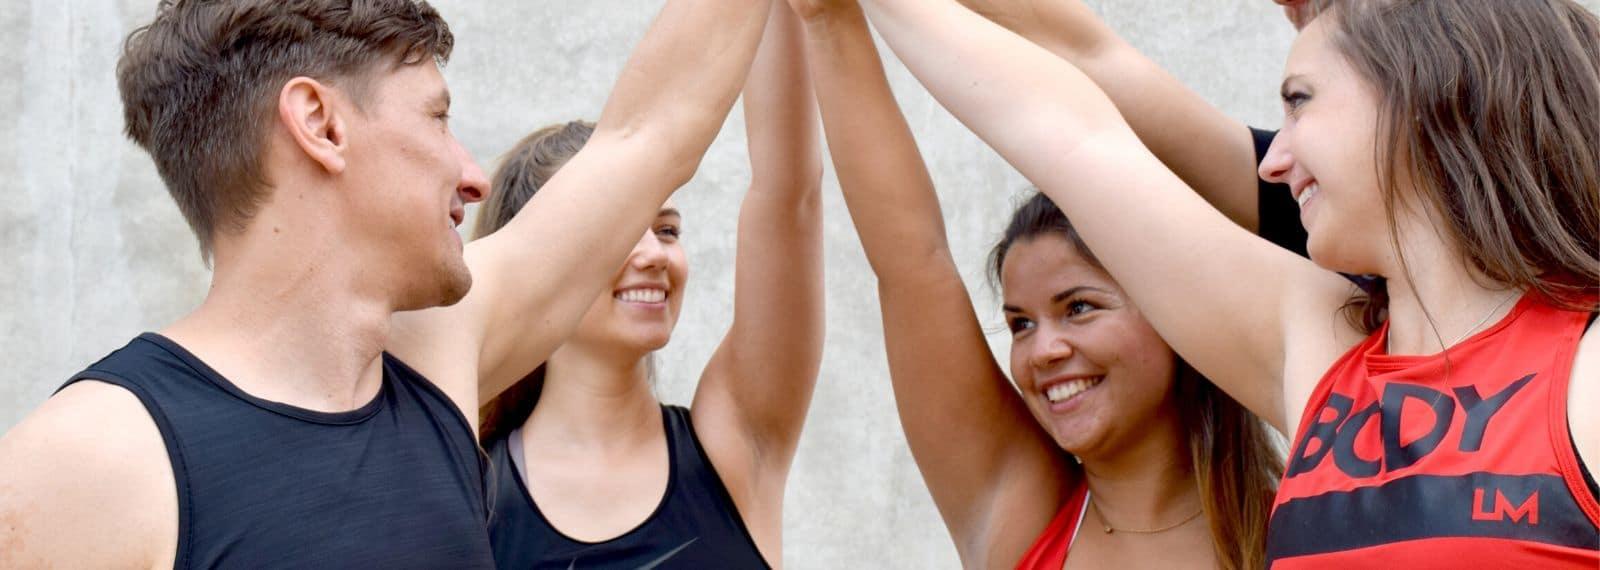 Trainerteam aus dem Fitness-Loft